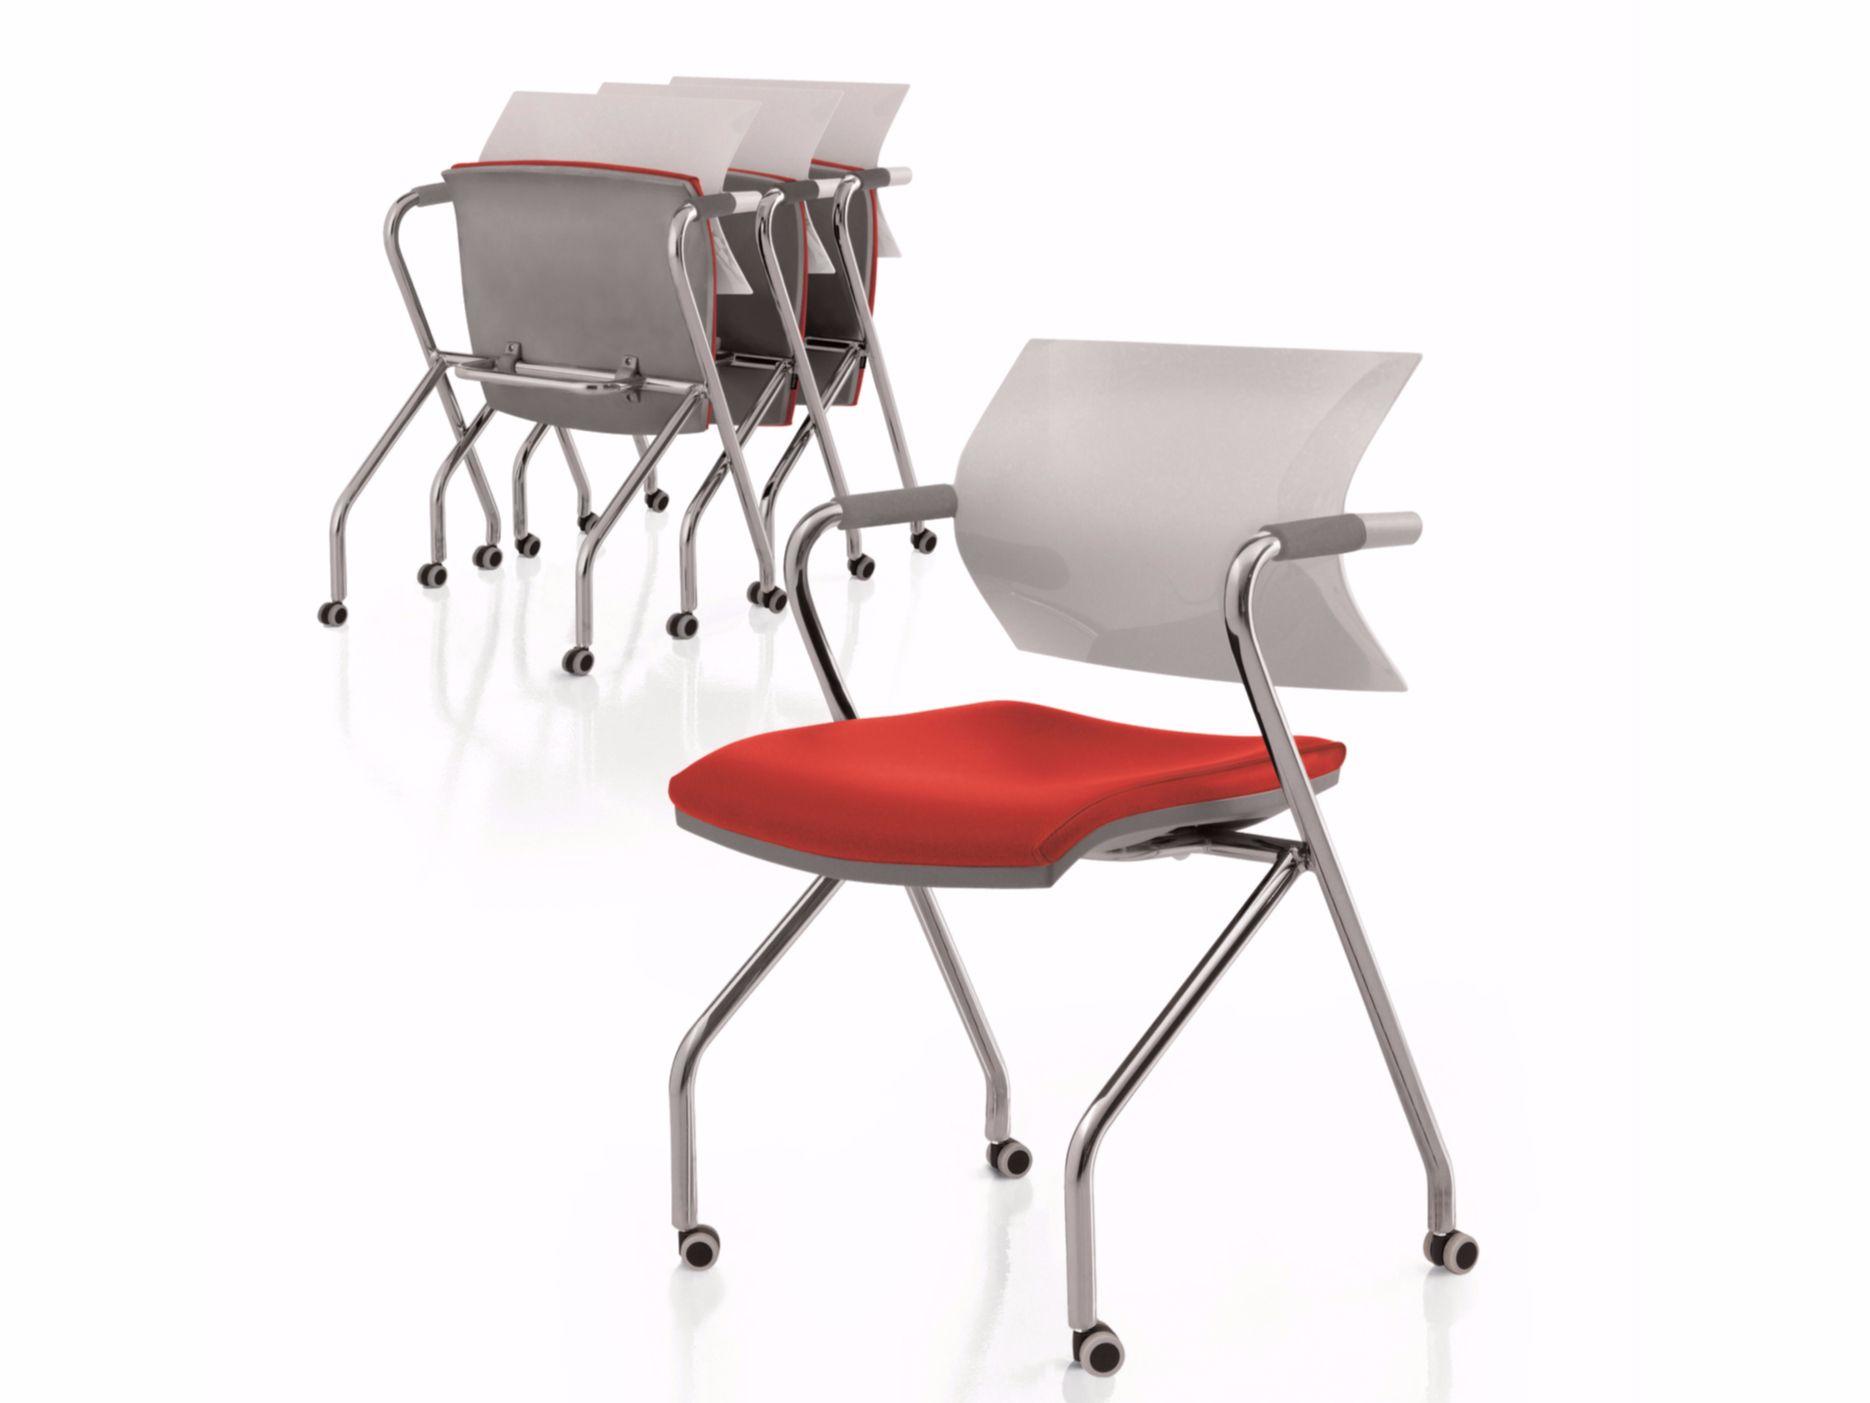 aire jr chaise pliante collection aire jr by luxy design stefano getzel. Black Bedroom Furniture Sets. Home Design Ideas